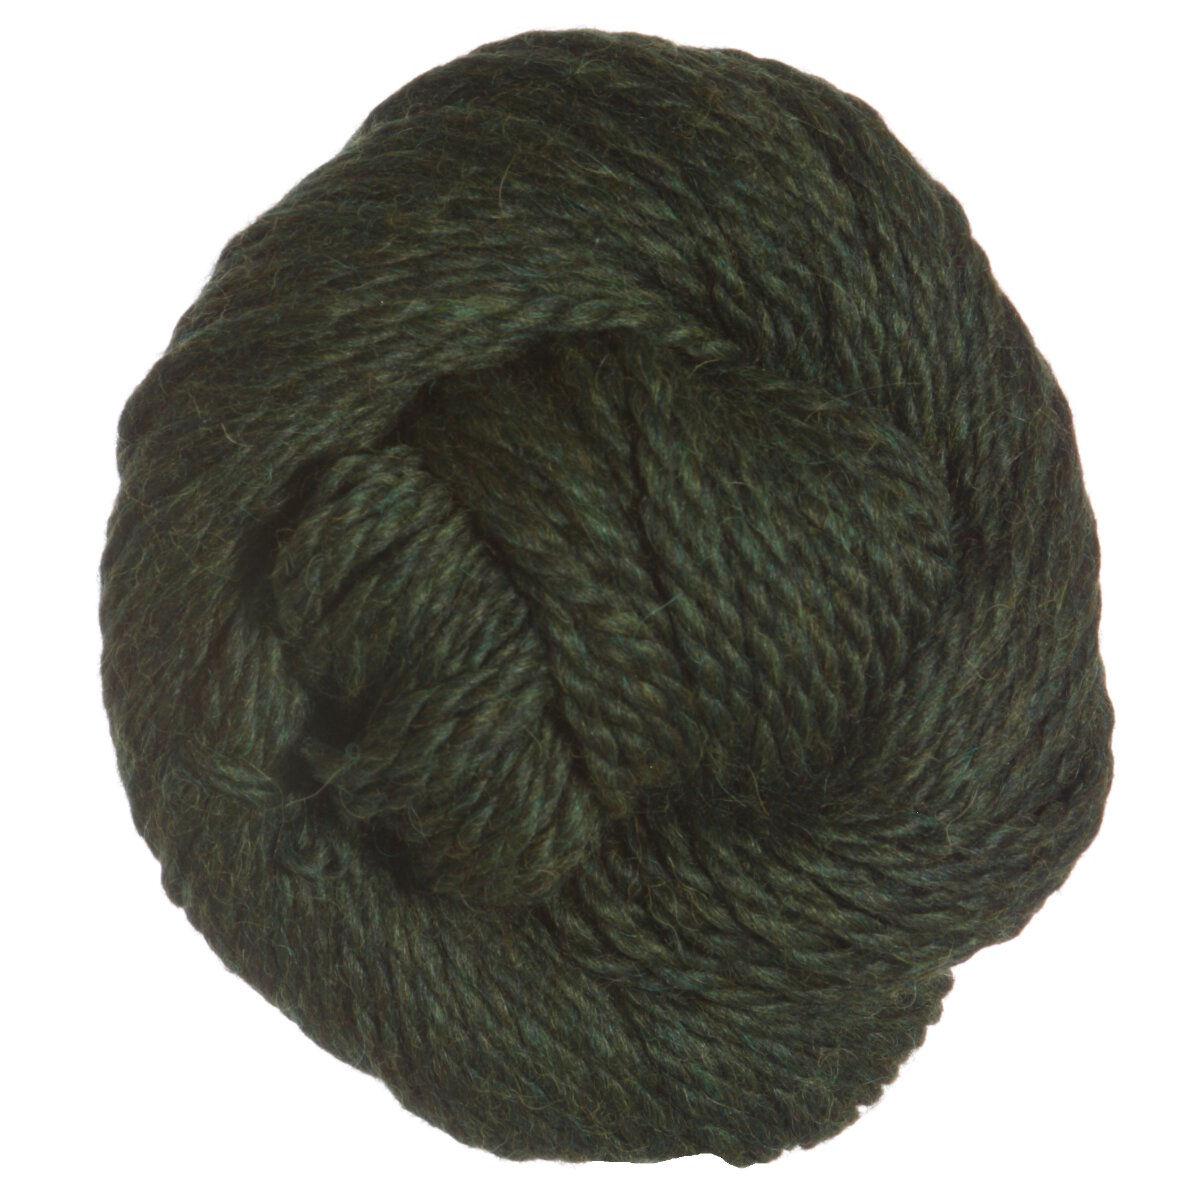 Knitting Patterns Alpaca Chunky : Misti Alpaca Chunky Solids Yarn at Jimmy Beans Wool